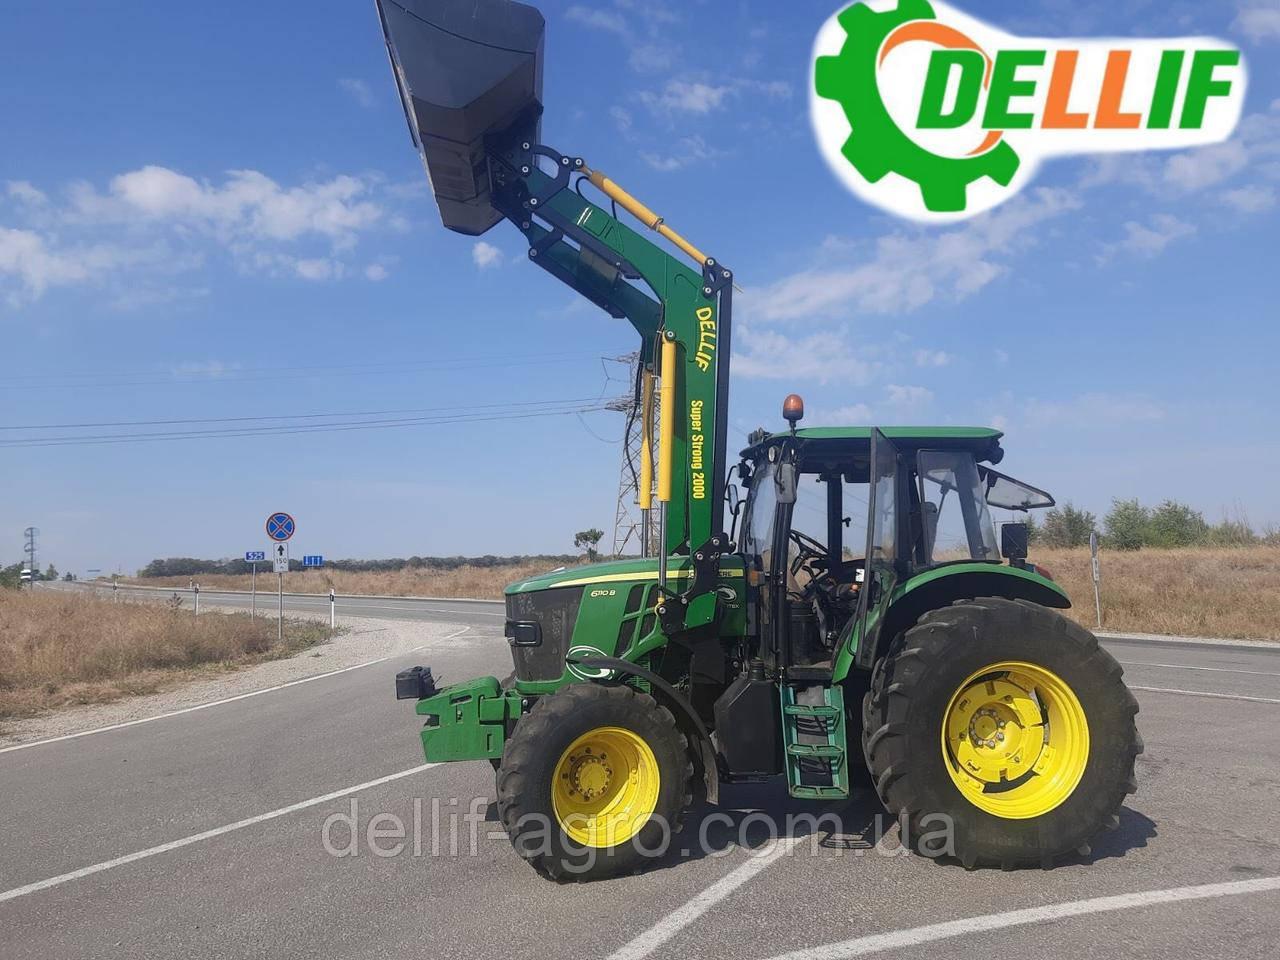 Навантажувач Фронтальний КУН Dellif Super Strong 2000, на трактори до 140 л. с.